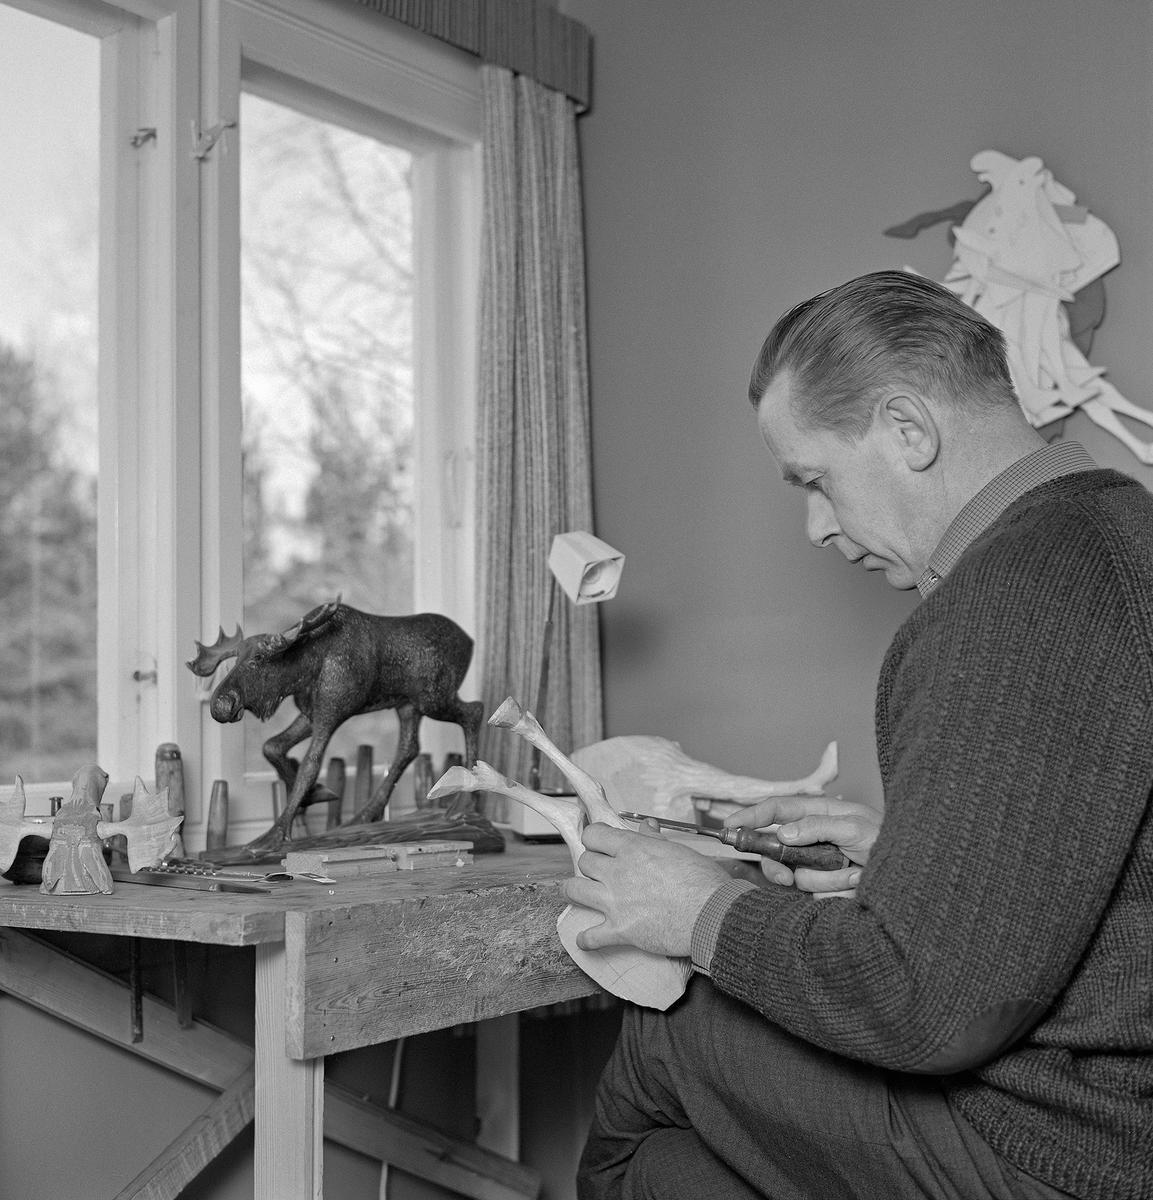 Bilde viser Vidar Sandbeck mens han skjærer en elg (Foto/Photo)